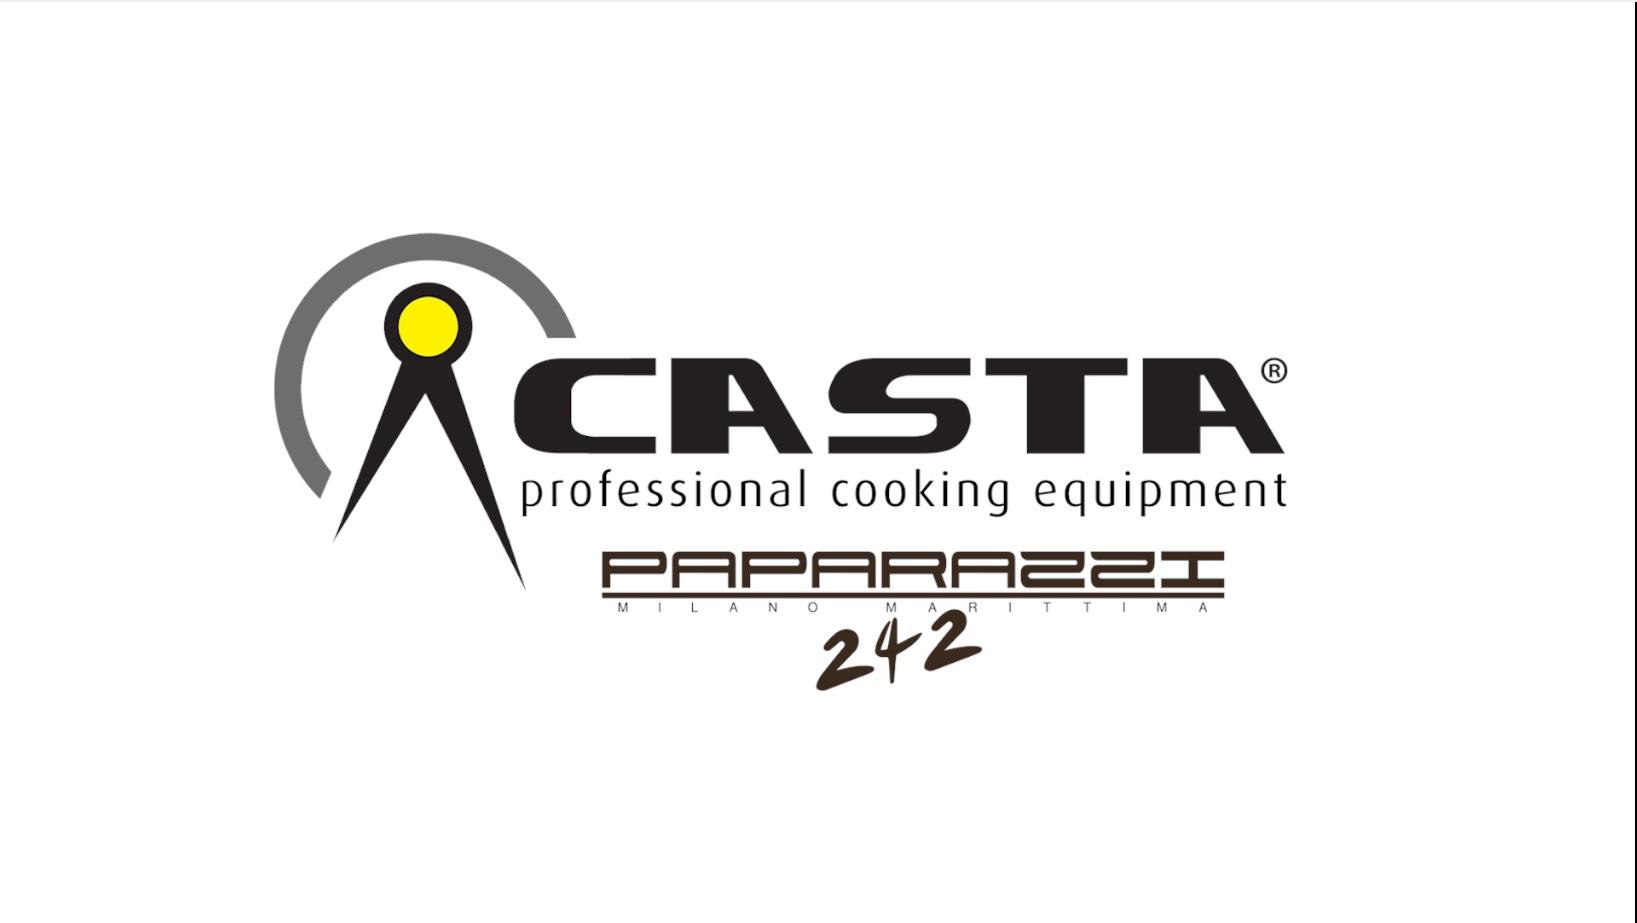 Casta Professional Cooking Equipment - Bagno Paparazzi Milano Marittima